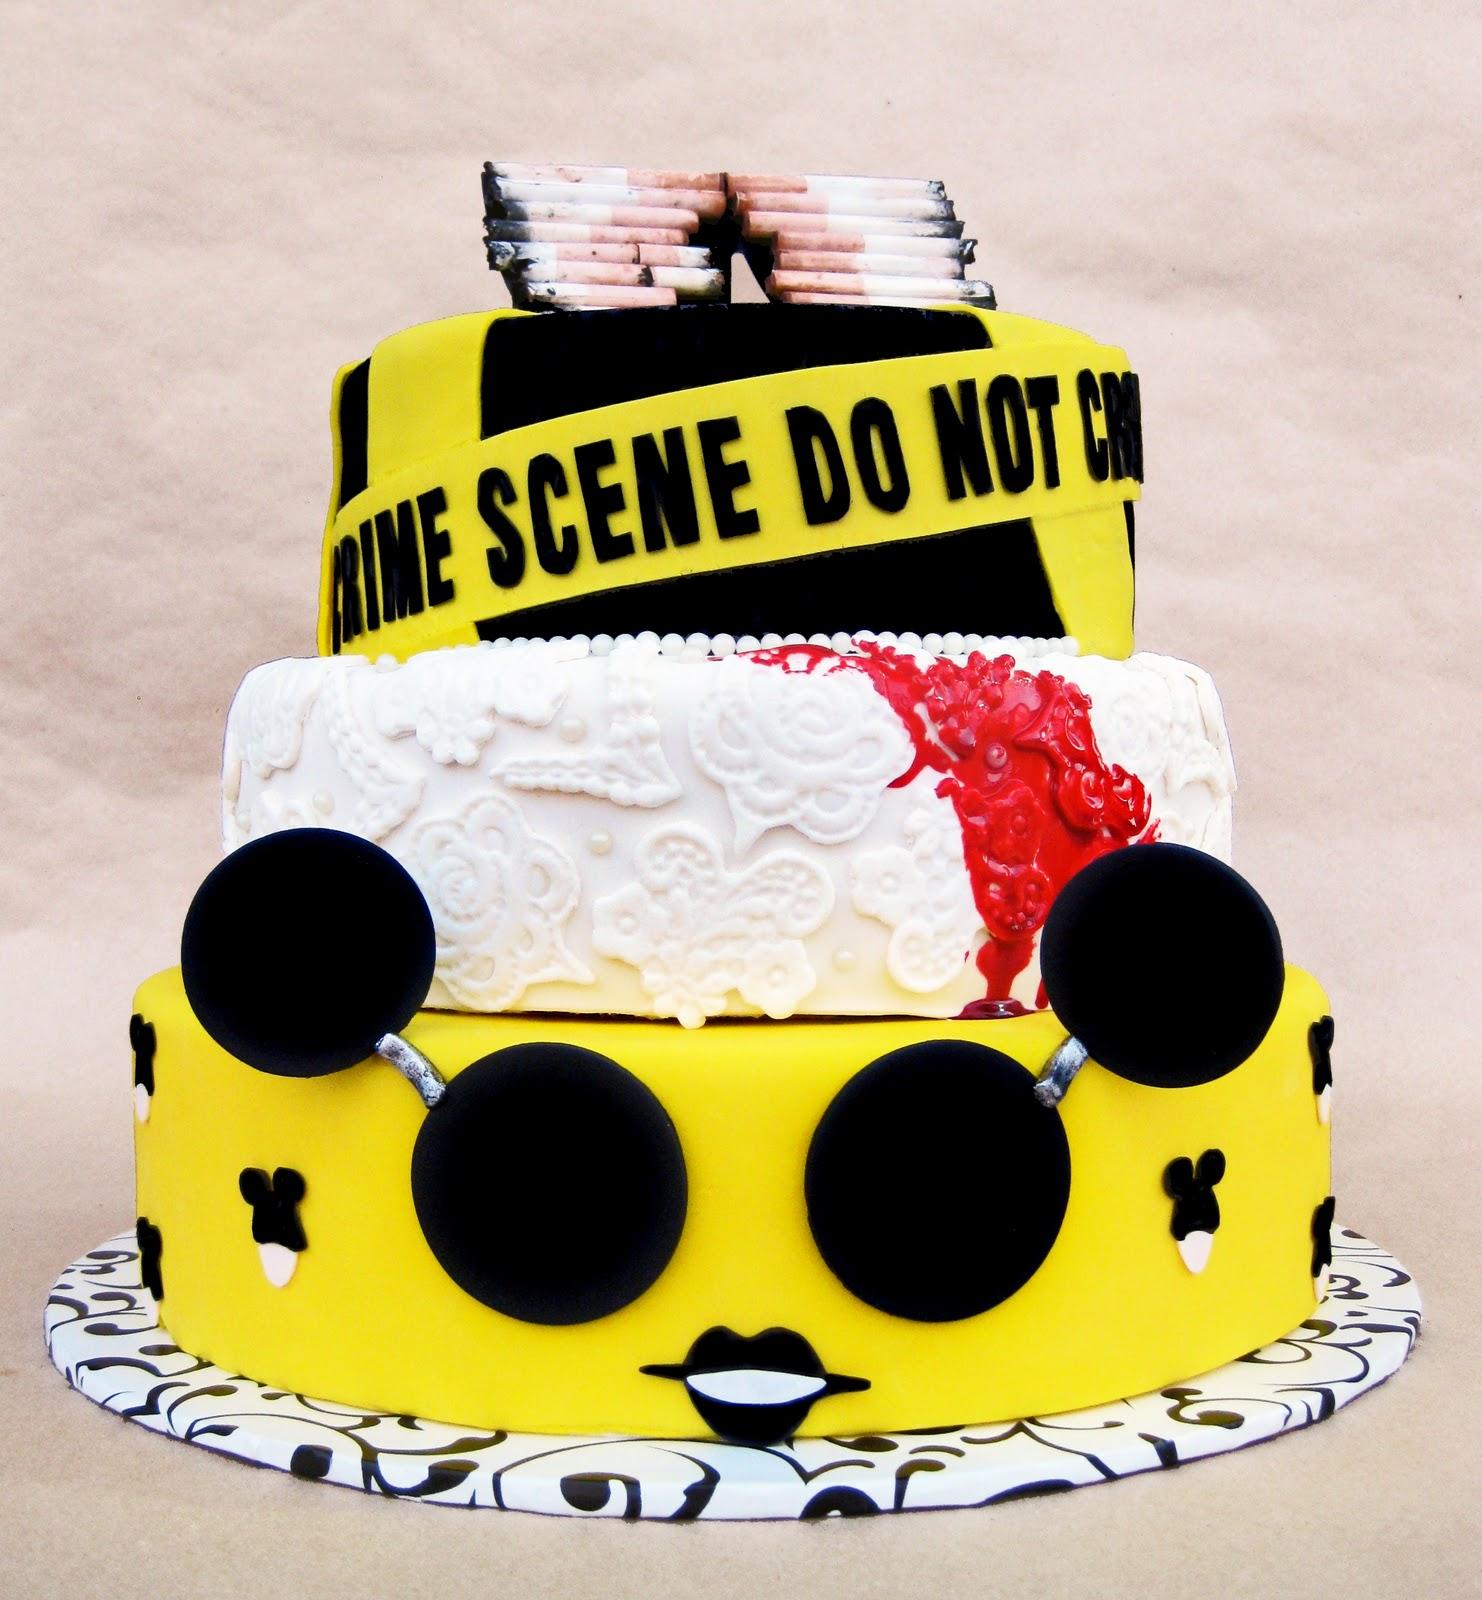 http://4.bp.blogspot.com/_HxxyR2Qt0cM/TJk3OFbcg6I/AAAAAAAAAWc/_CUItp3foO4/s1600/gaga+cake.jpg